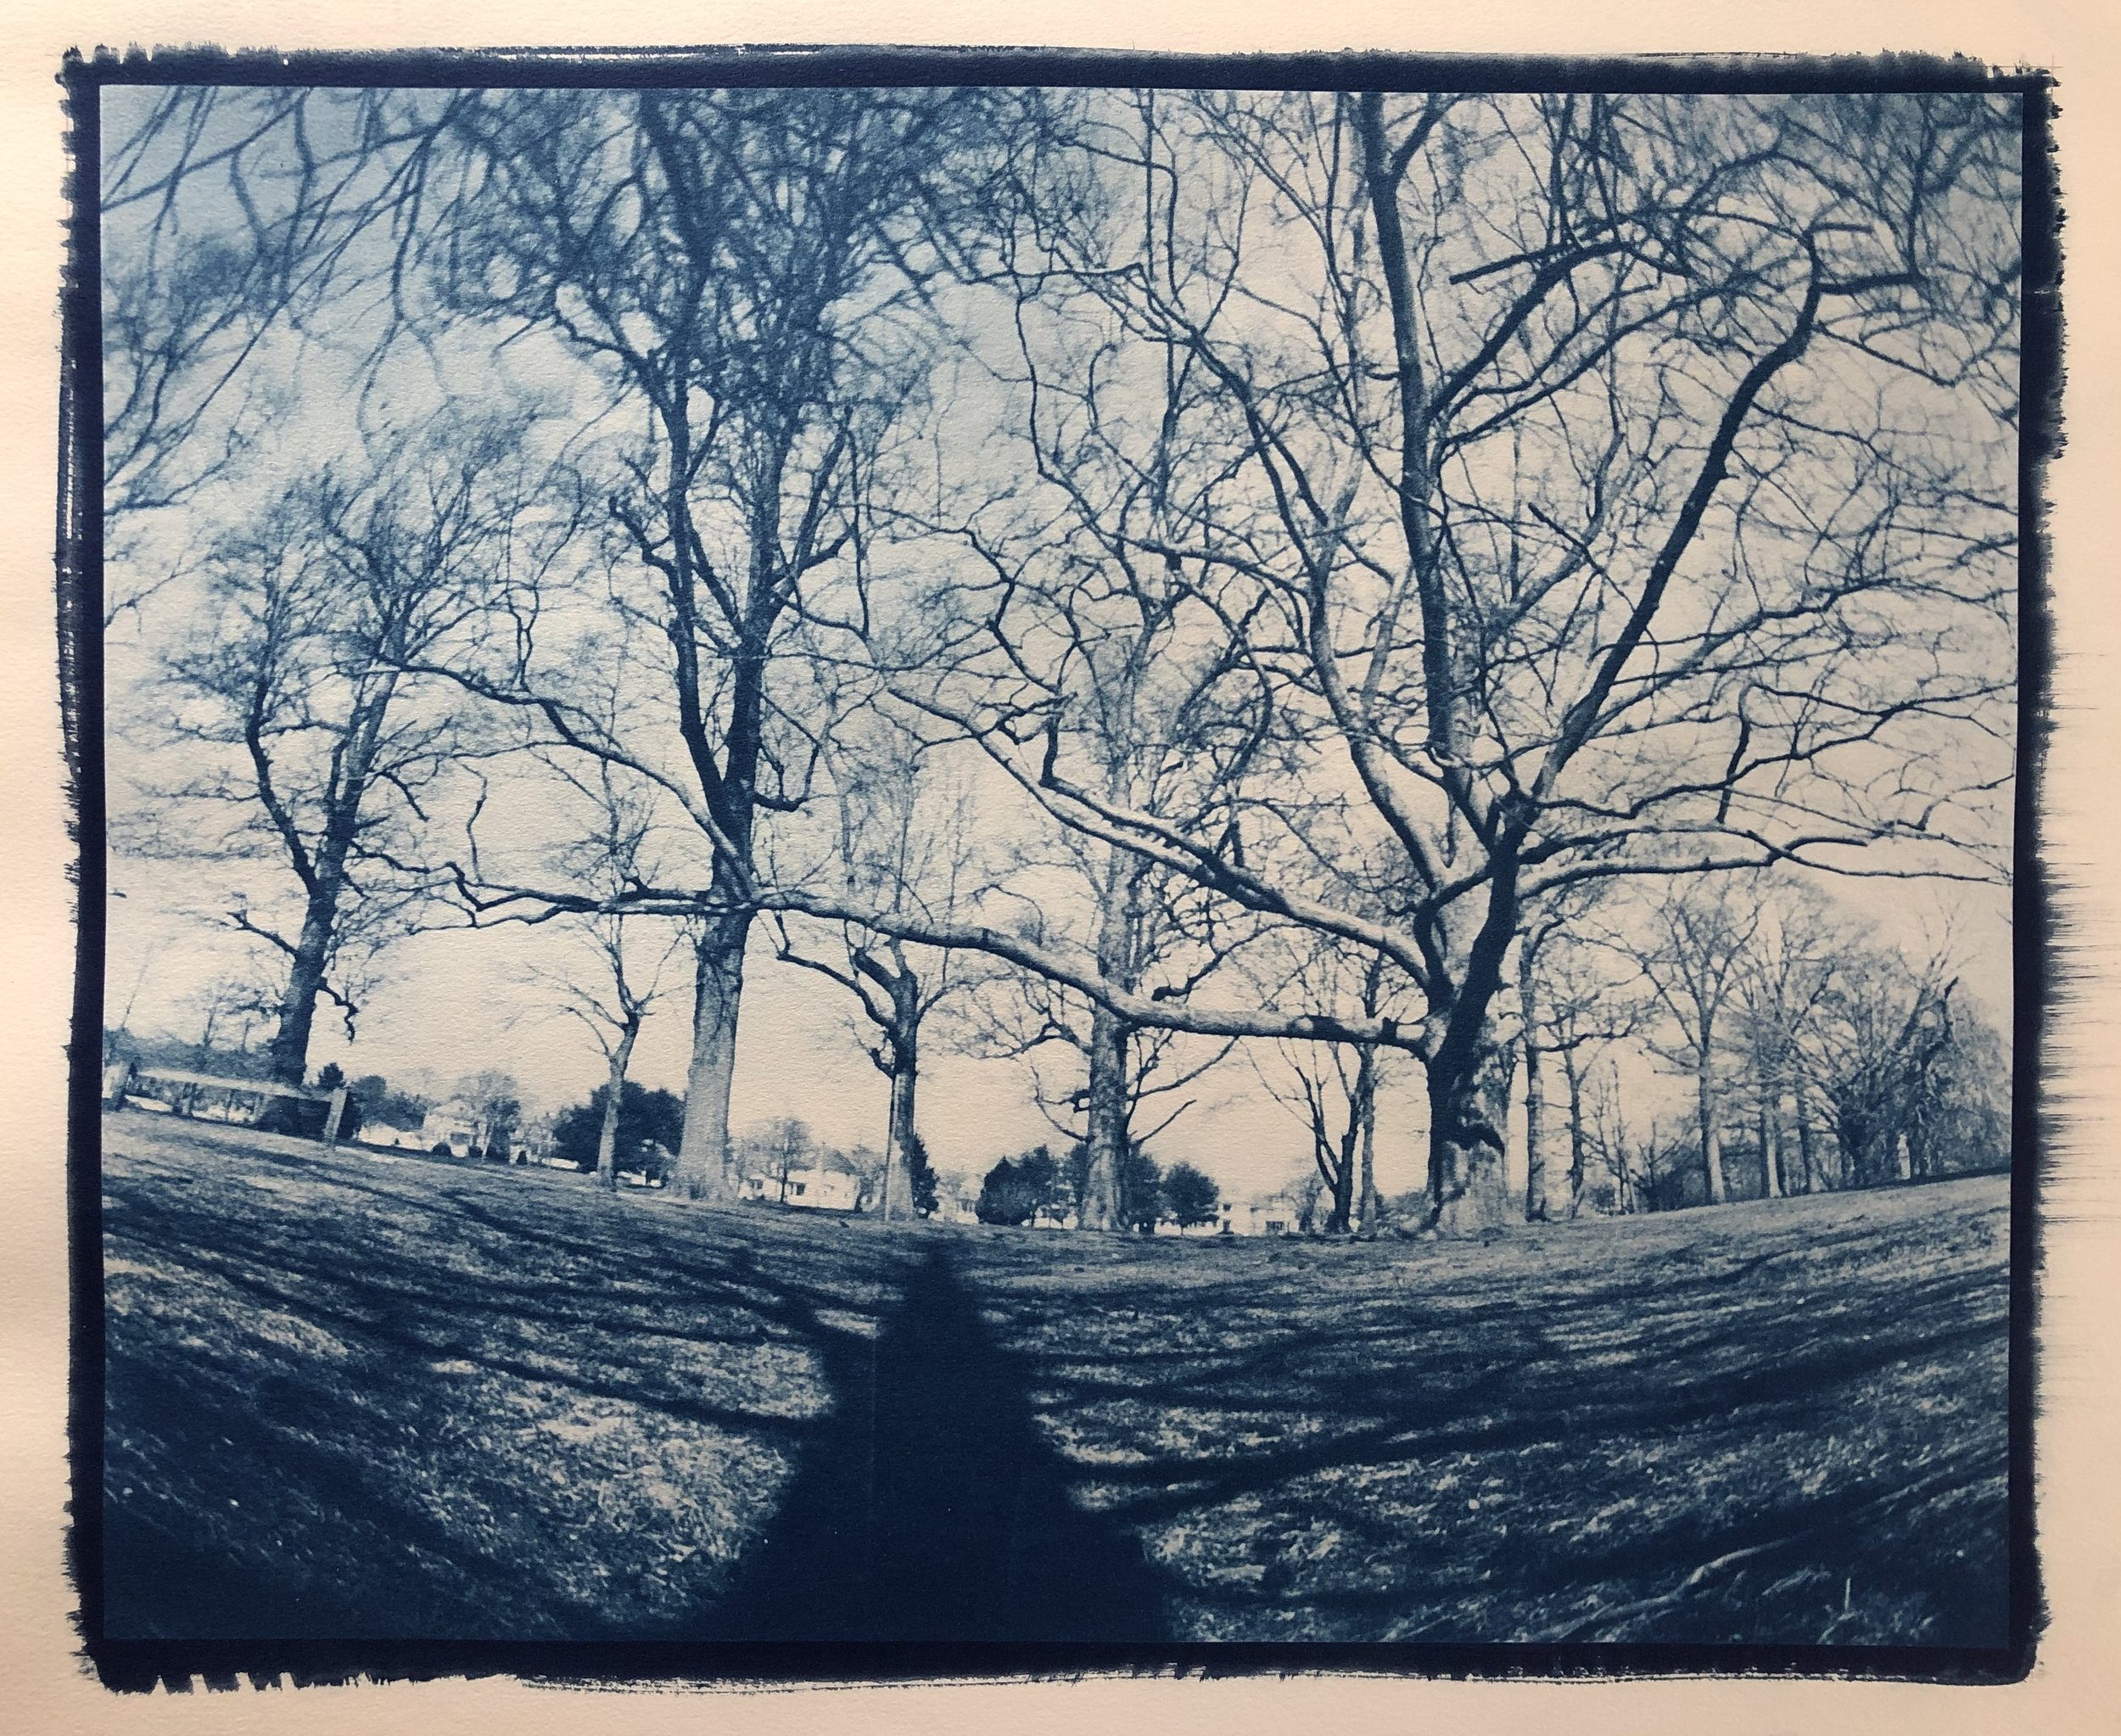 Mstpierre_Buttonwood Park.jpg